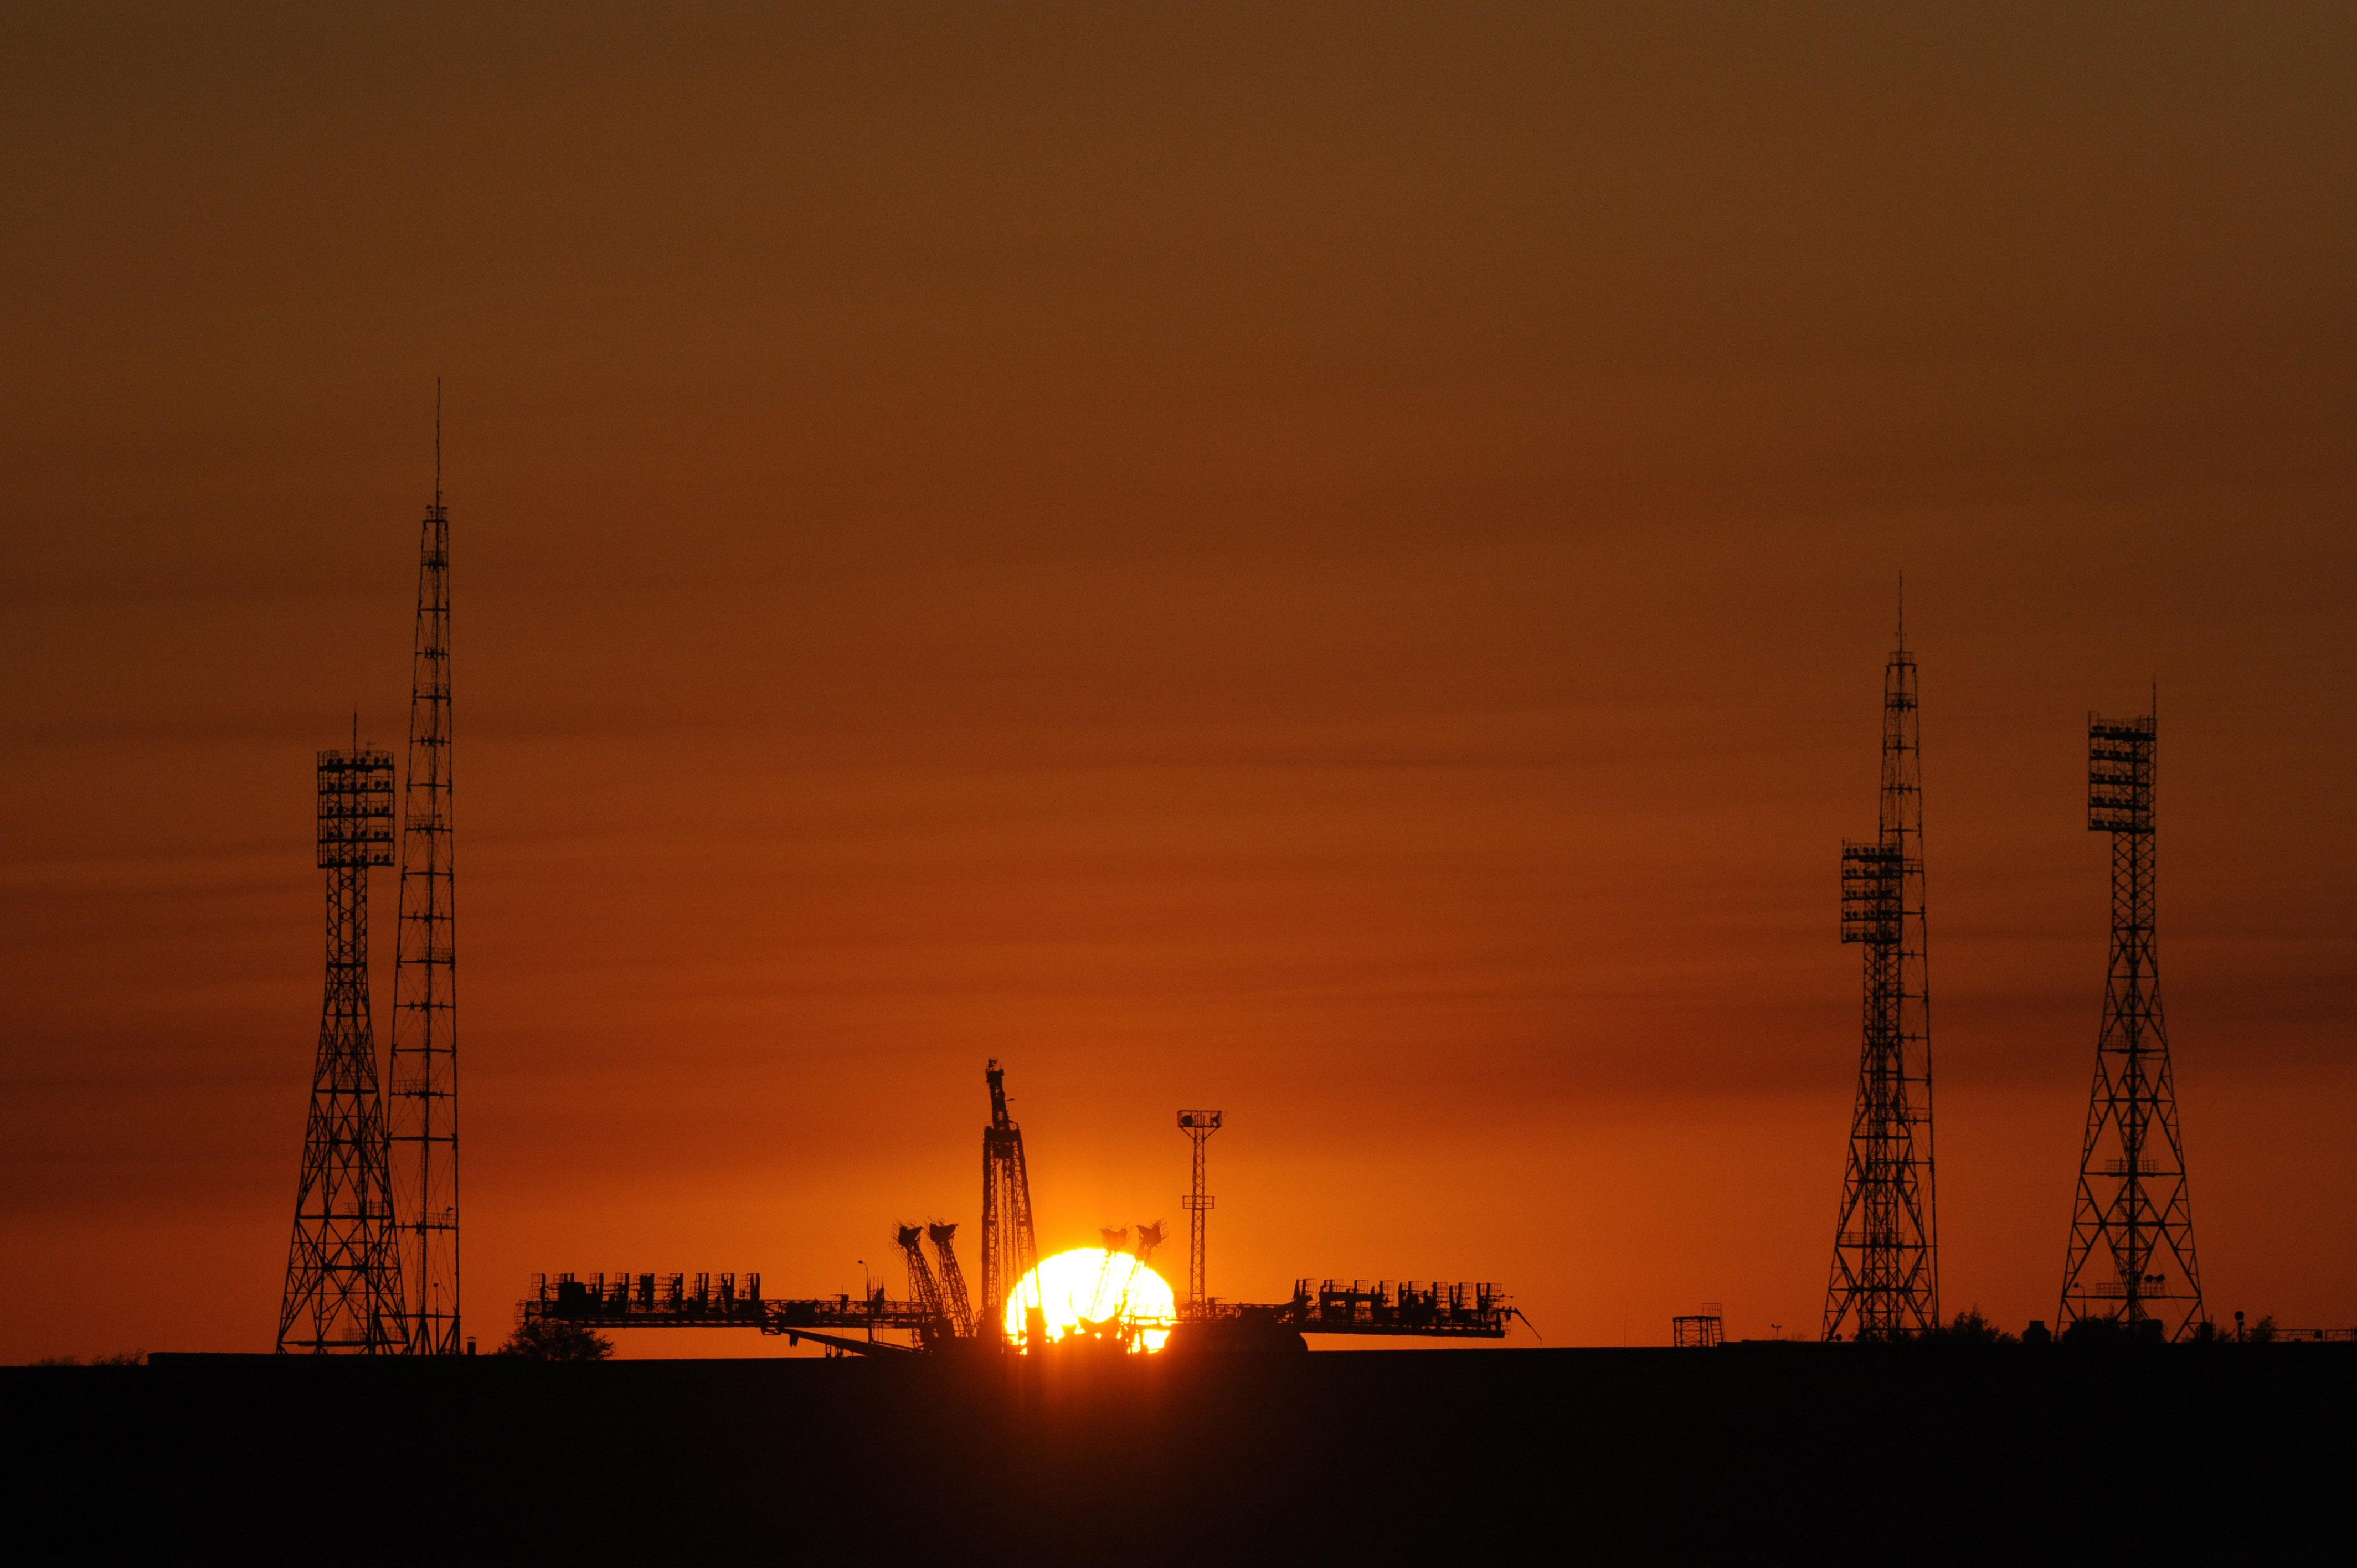 Baikonur Cosmodrome - Wikipedia